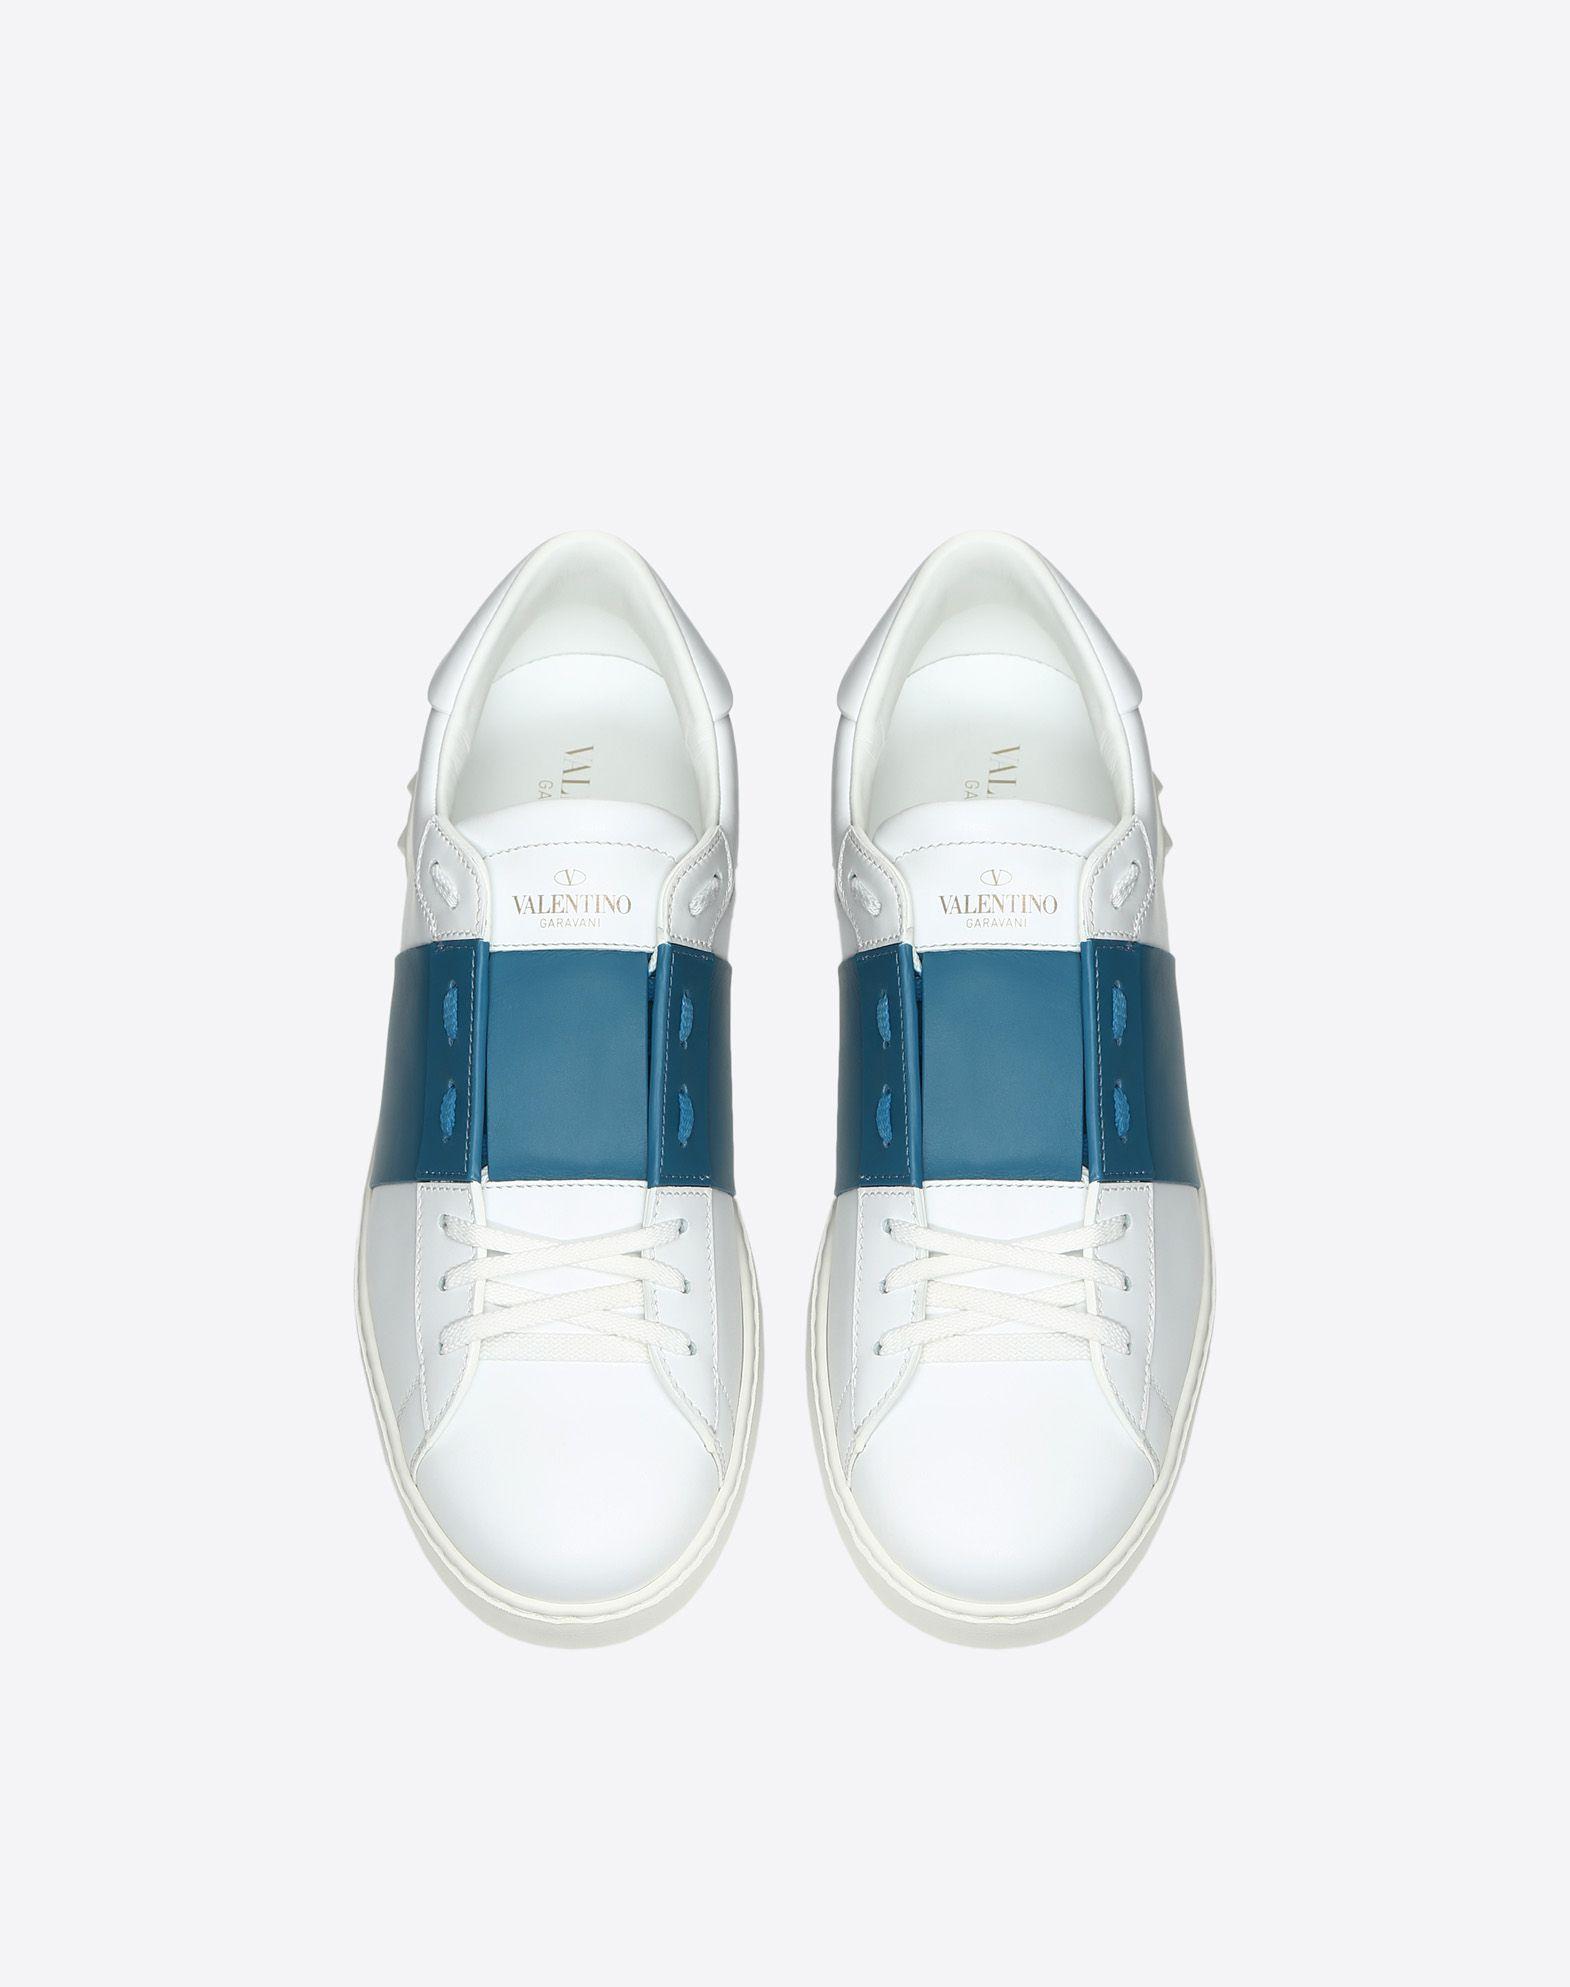 VALENTINO GARAVANI UOMO Sneaker Open  LOW-TOP SNEAKERS U e